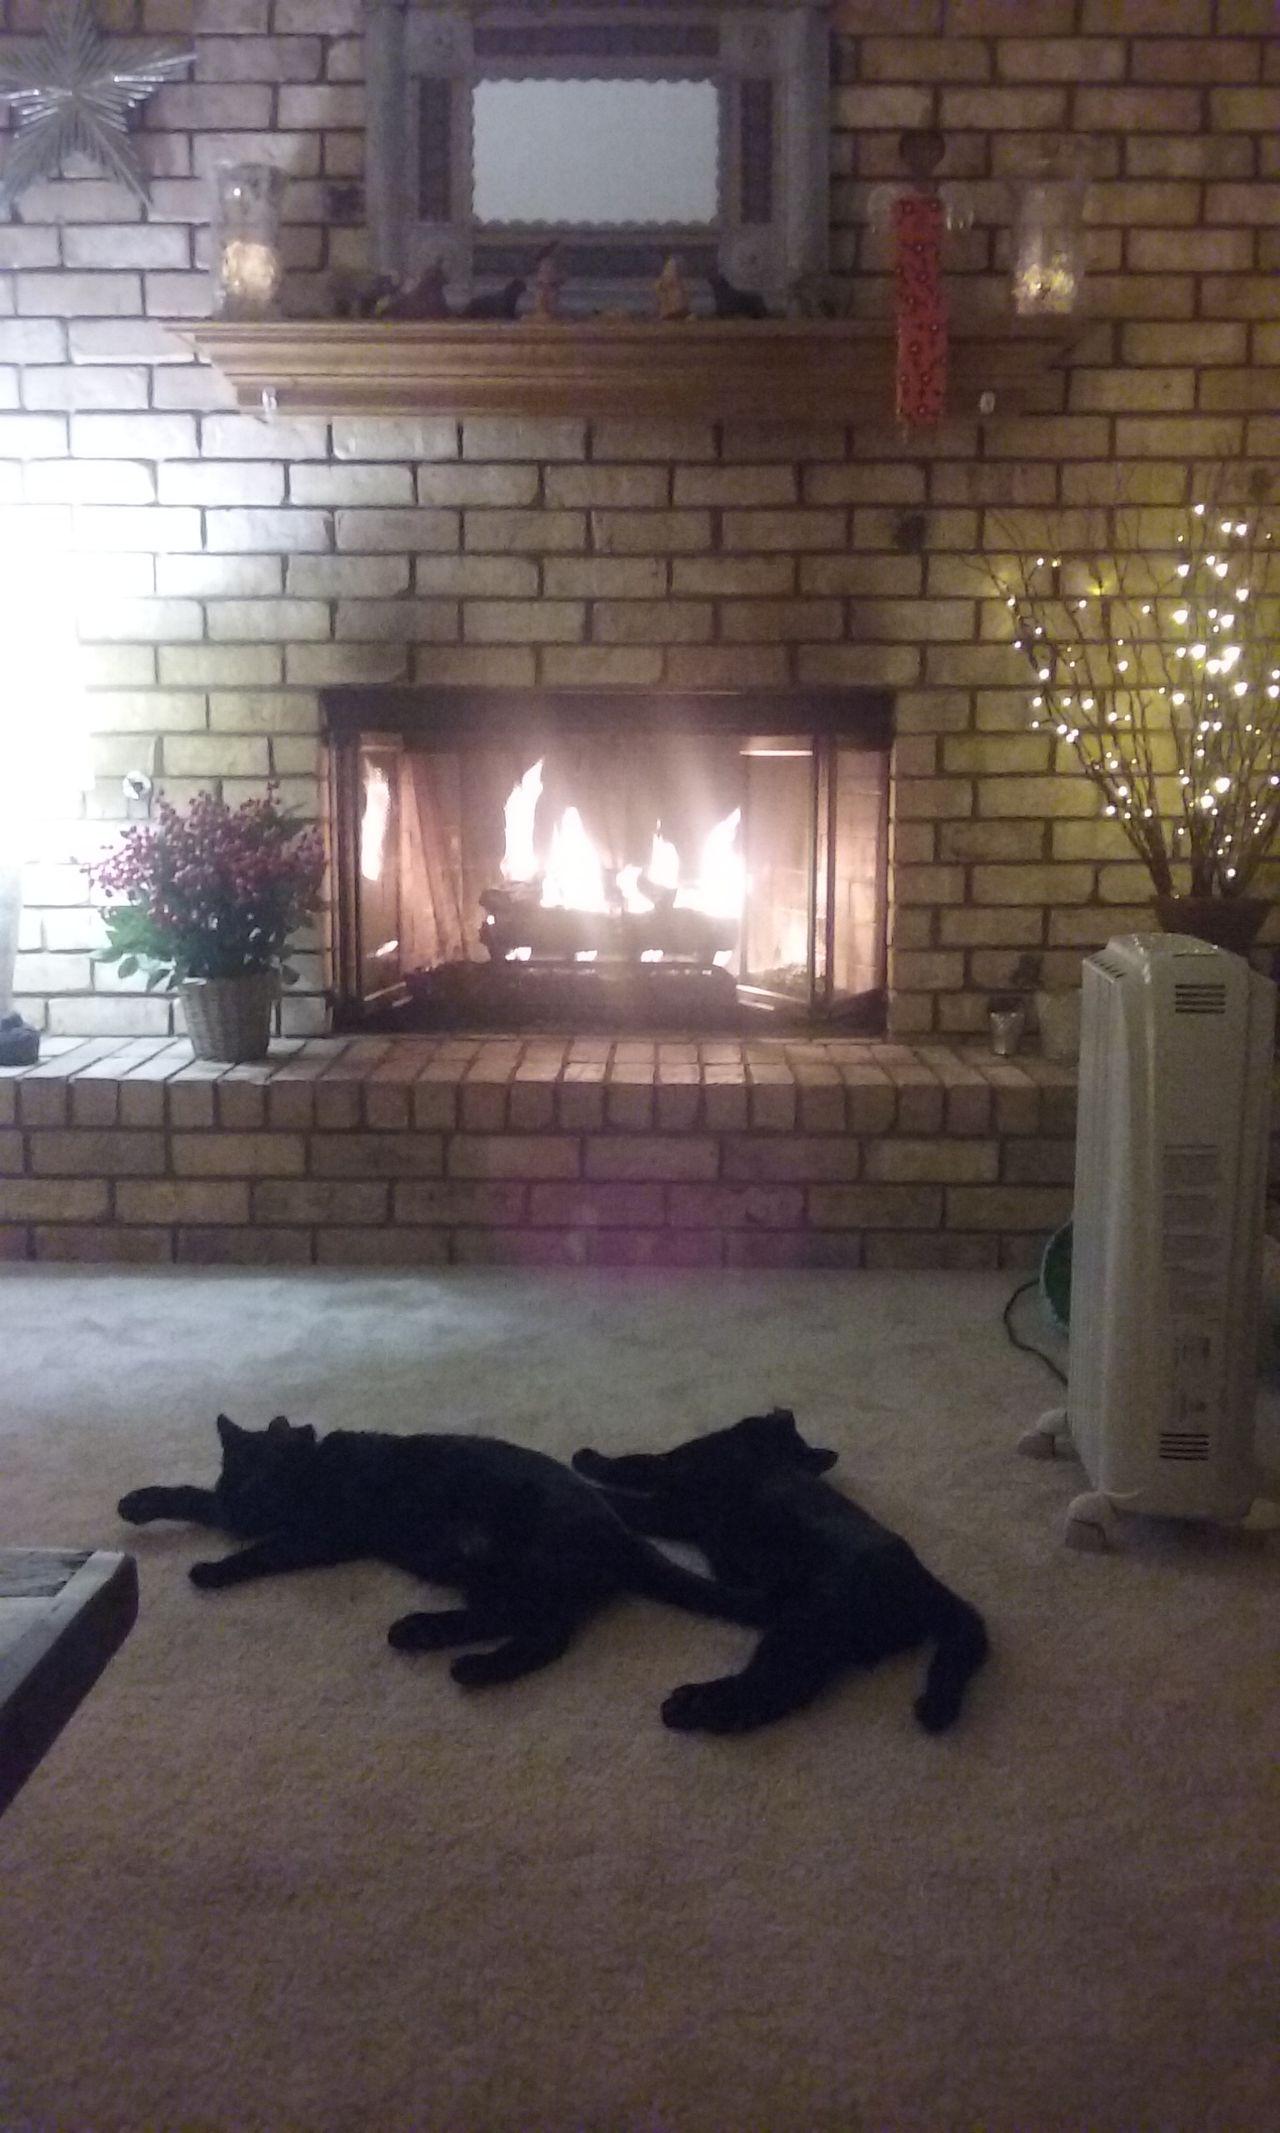 Fireplace Love Animal Themes Brick Wall Cats Cats Of EyeEm Cats 🐱 Fireplace Fireplace Warmth Friends Indoors  Mammal No People Pets Snuggle Snugglebuddy Two Cats Sleepin Warm